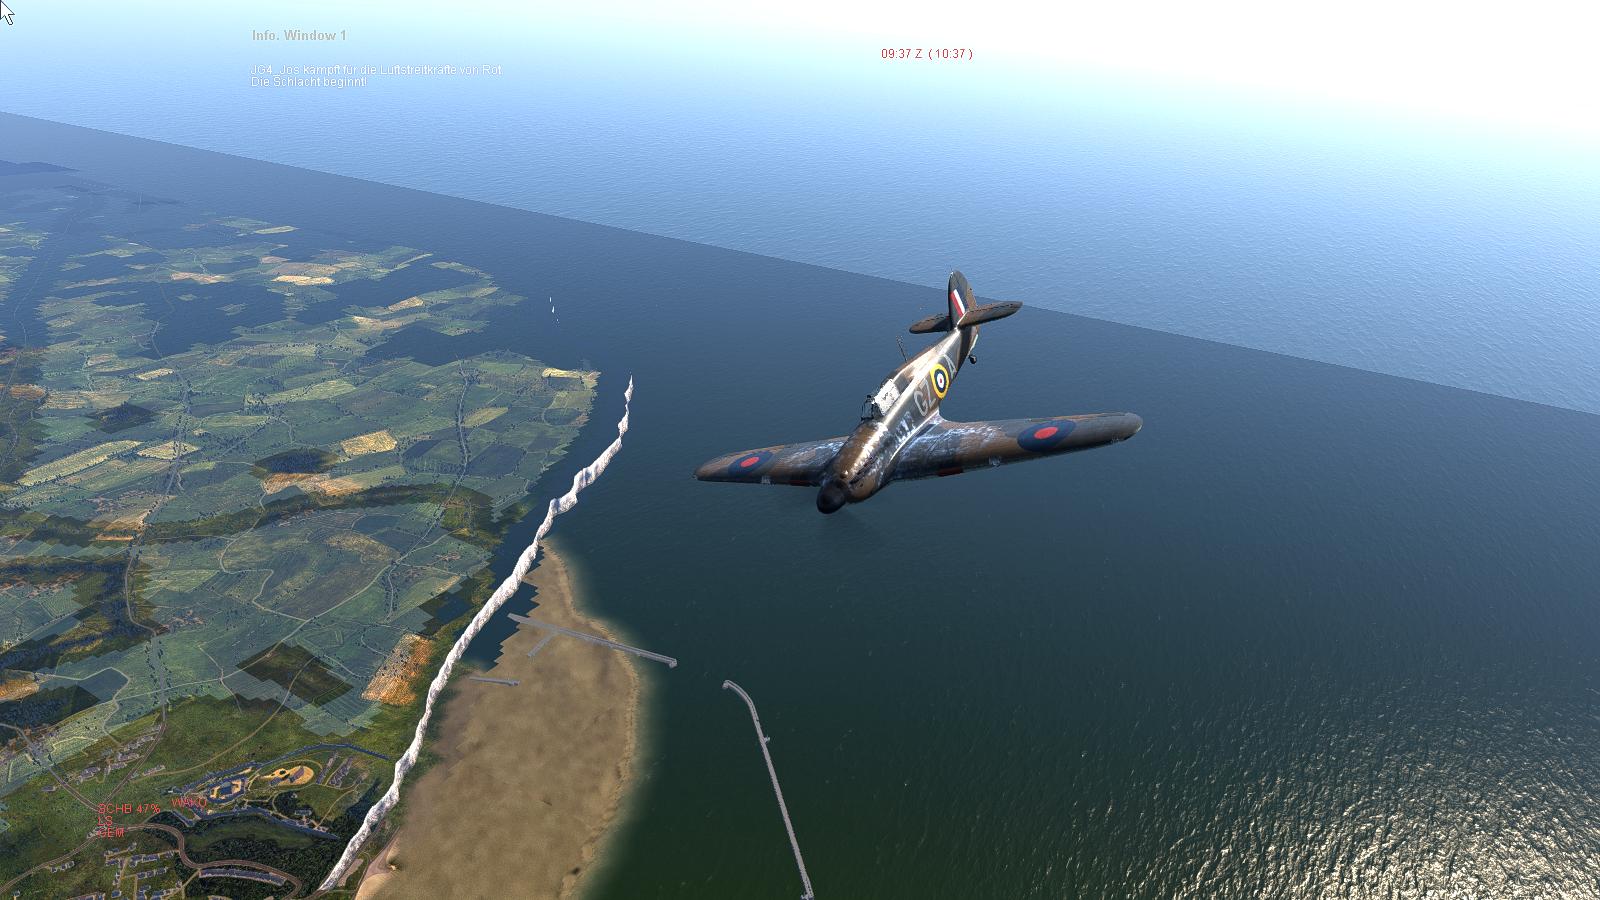 IL-2SturmovikCliffsofDover12.28.2016-10.37.13.05.png